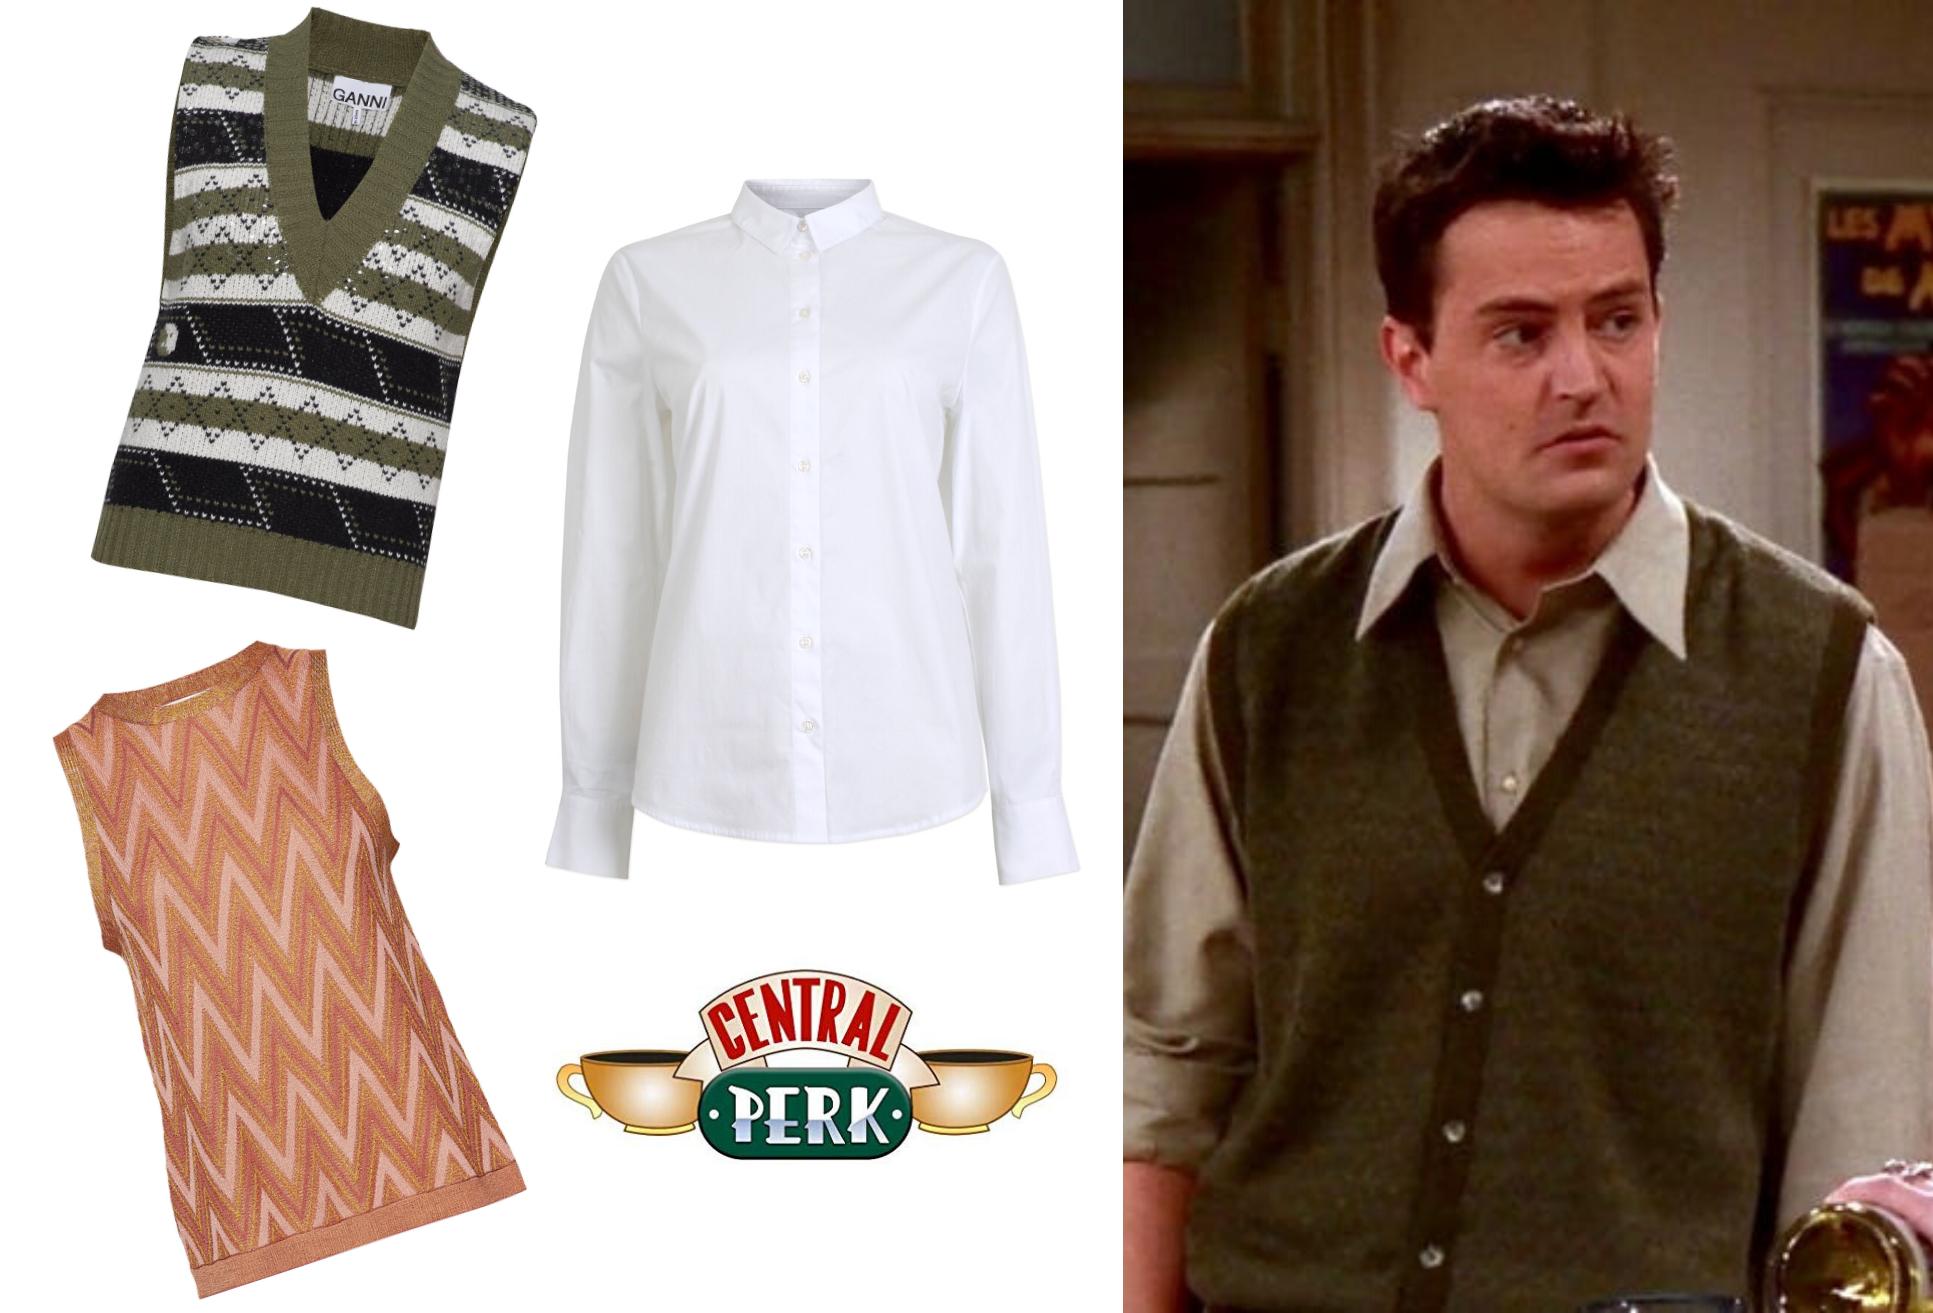 Chandler, inspiration, veste, skjorte, Friends. (Kollage: MY DAILY SPACE)